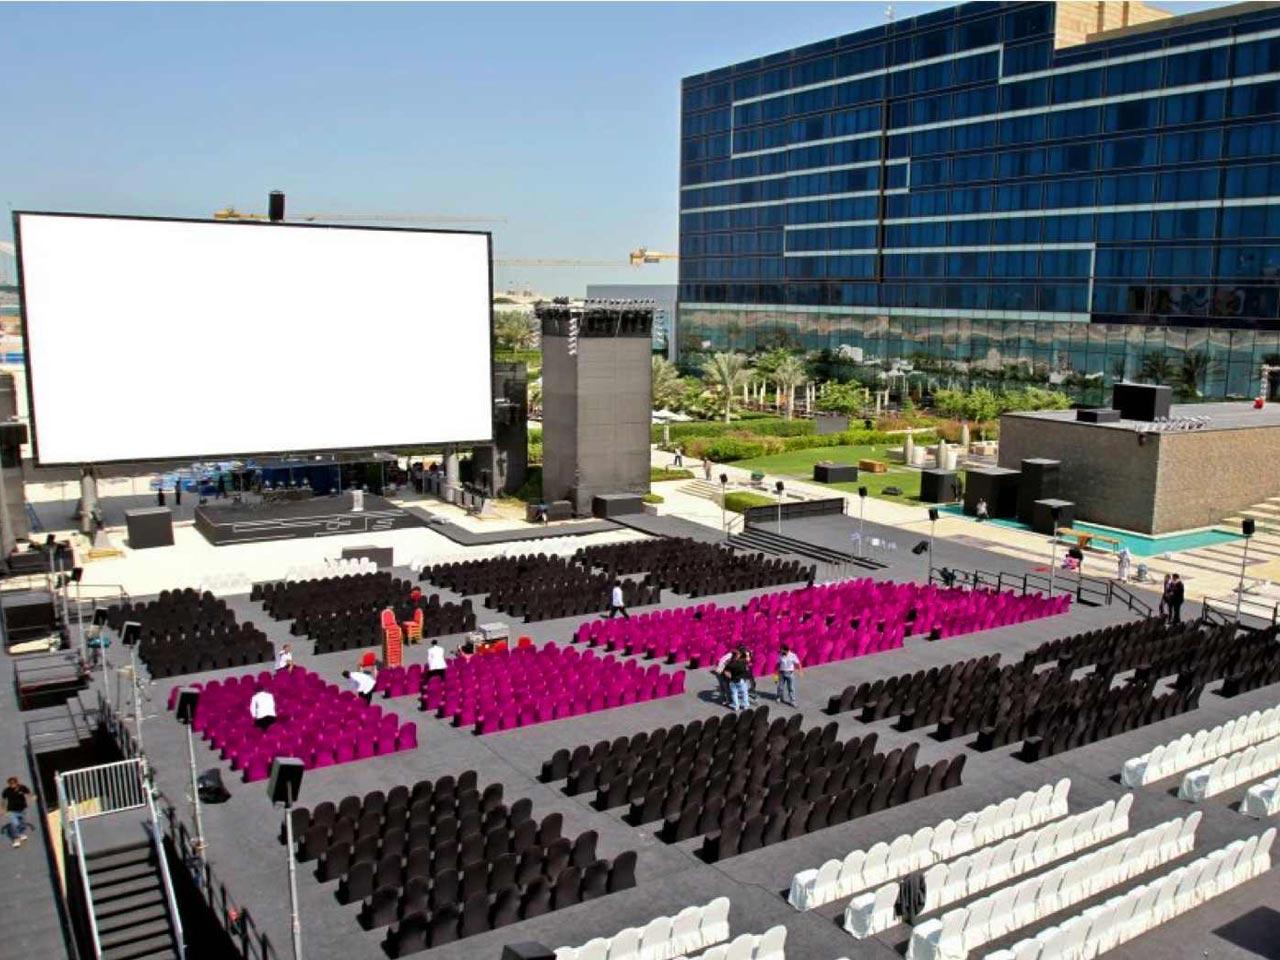 grandstand-seats-events-setup-rental-stadium-seating-sport-management-film-festival-seating-screening-f1-open-air-cinema-30